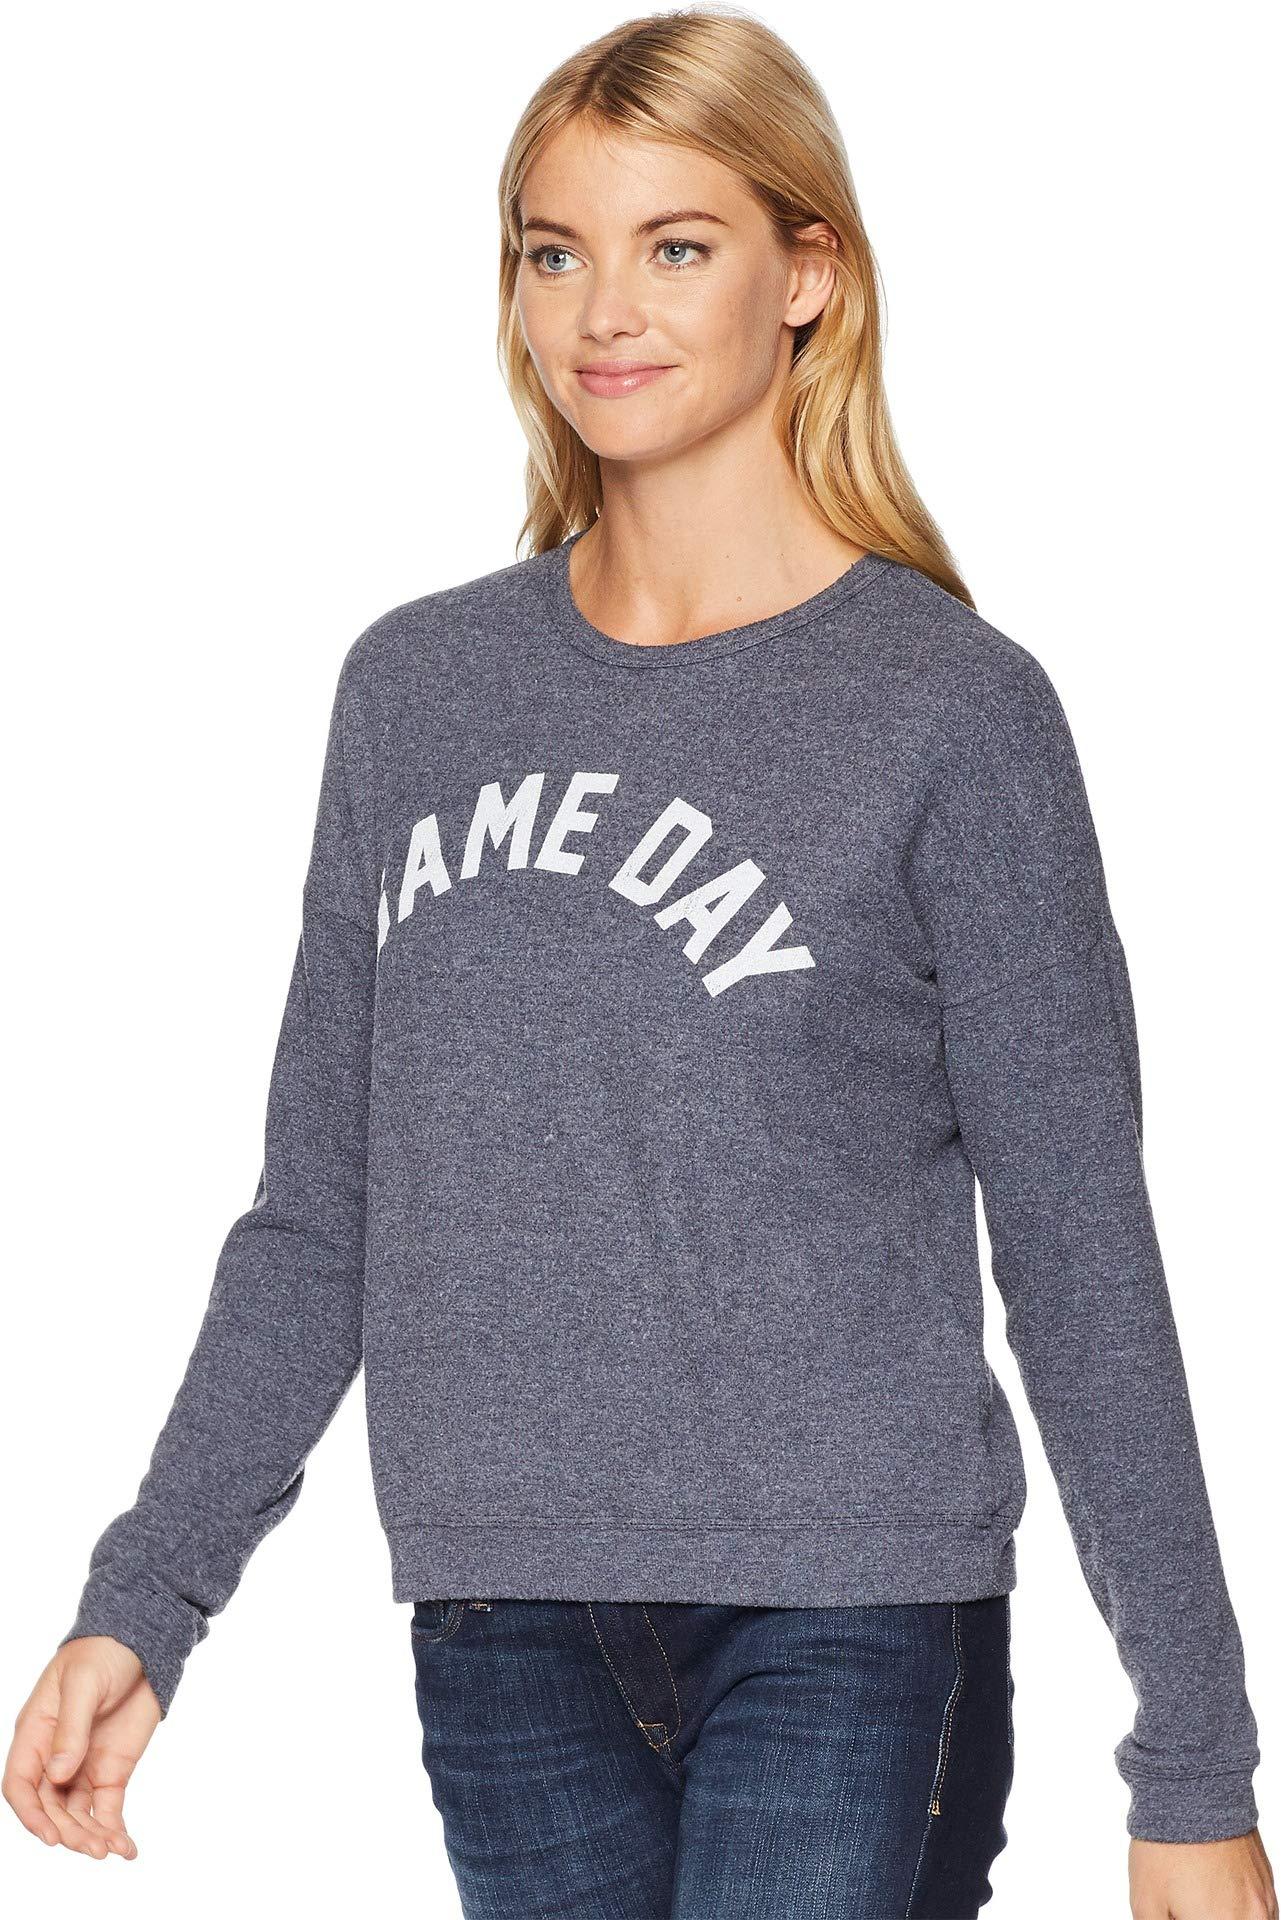 Original Retro Brand The Women's Game Day Super Soft Hacci Pullover Navy Haaci Large by Original Retro Brand (Image #2)